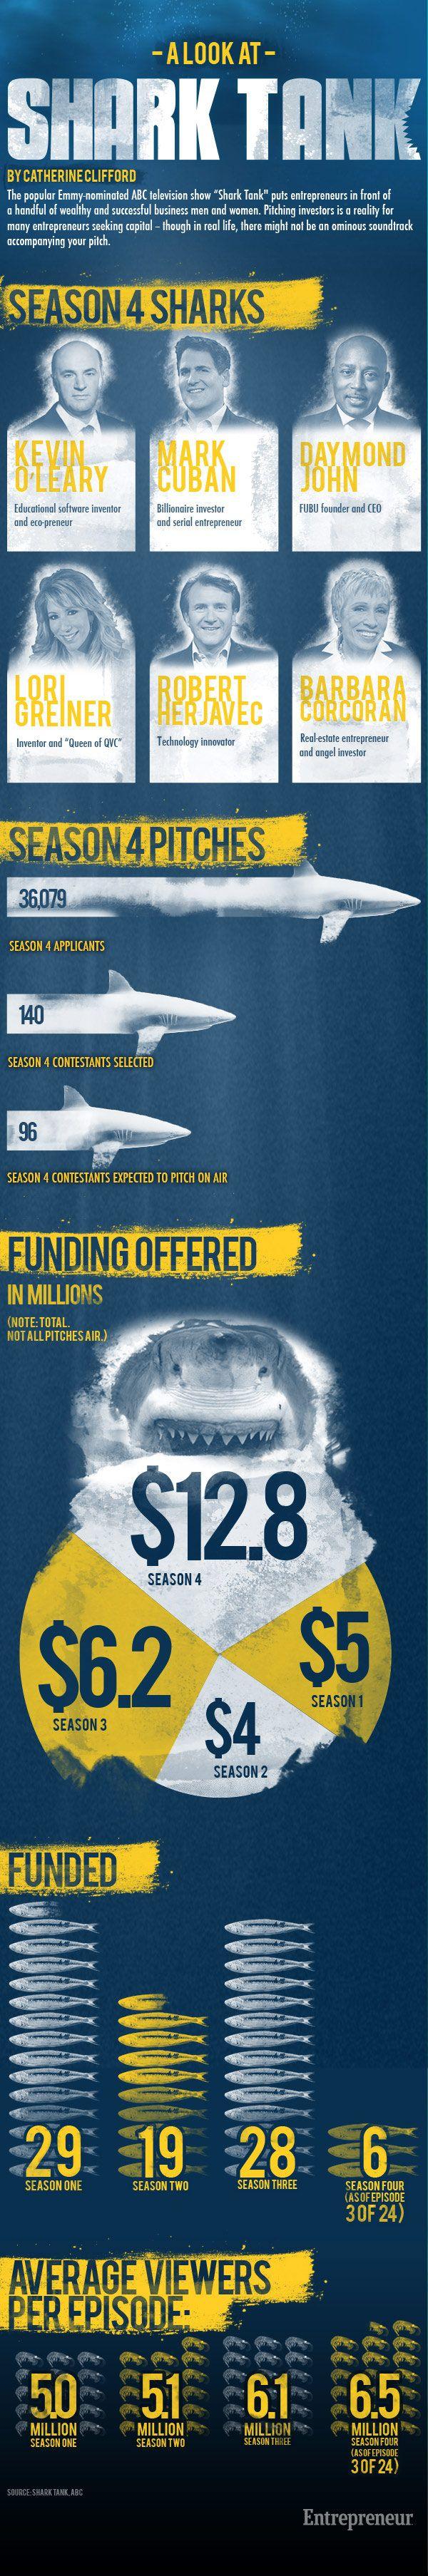 Shark Tank Popularizing Entrepreneurship #sharktank